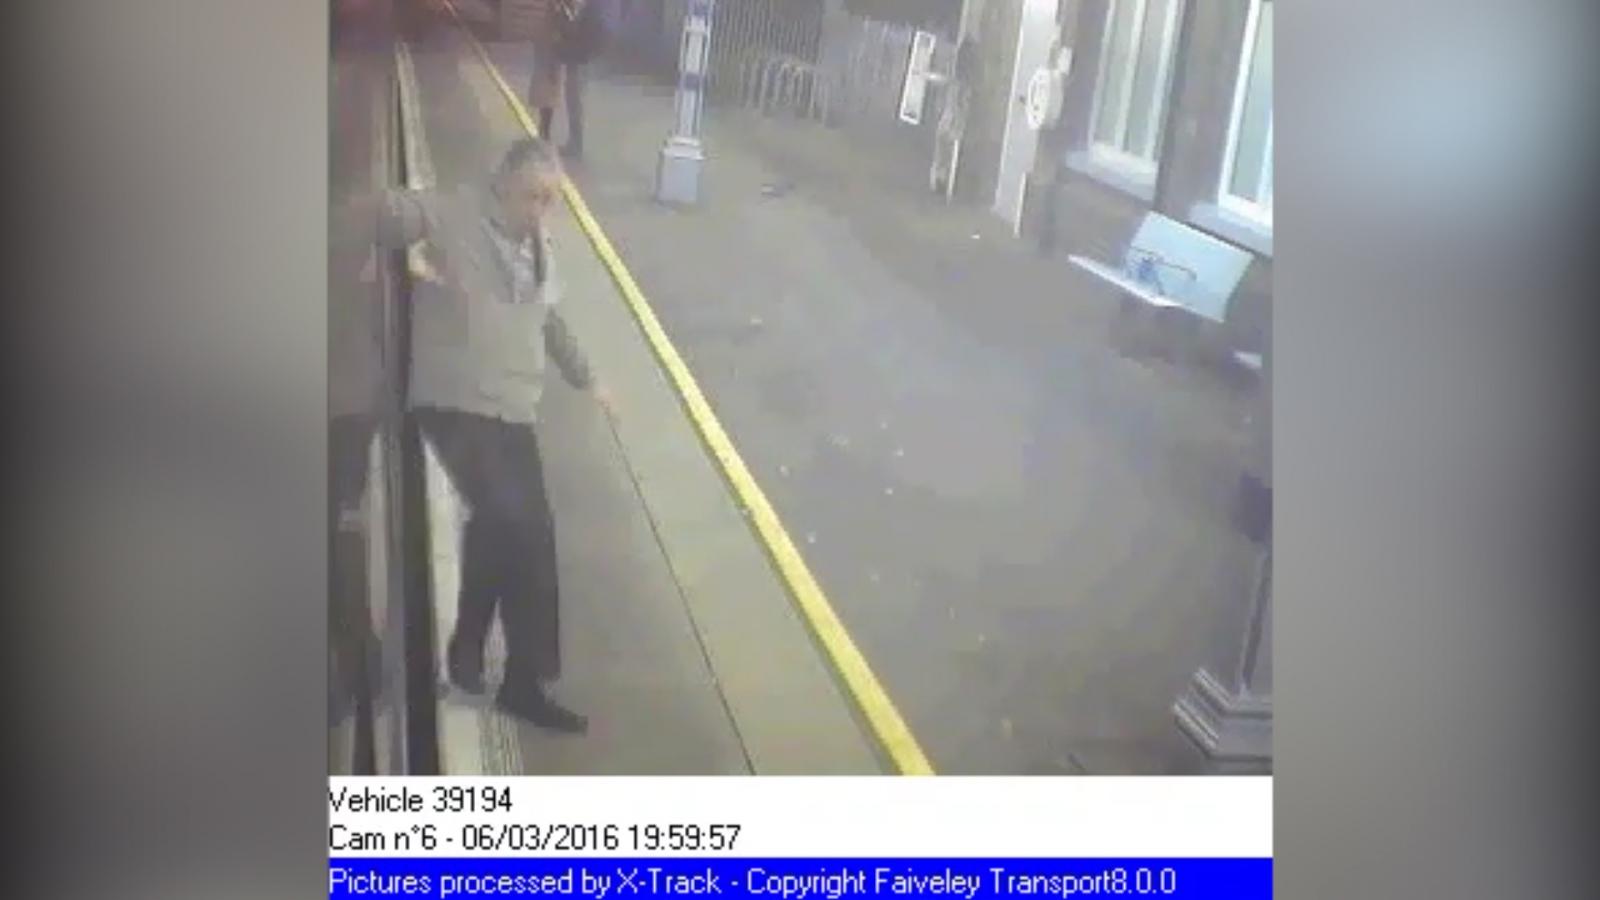 cctv-captures-shocking-moment-rail-passengers-rescue-man-who-had-fallen-under-train